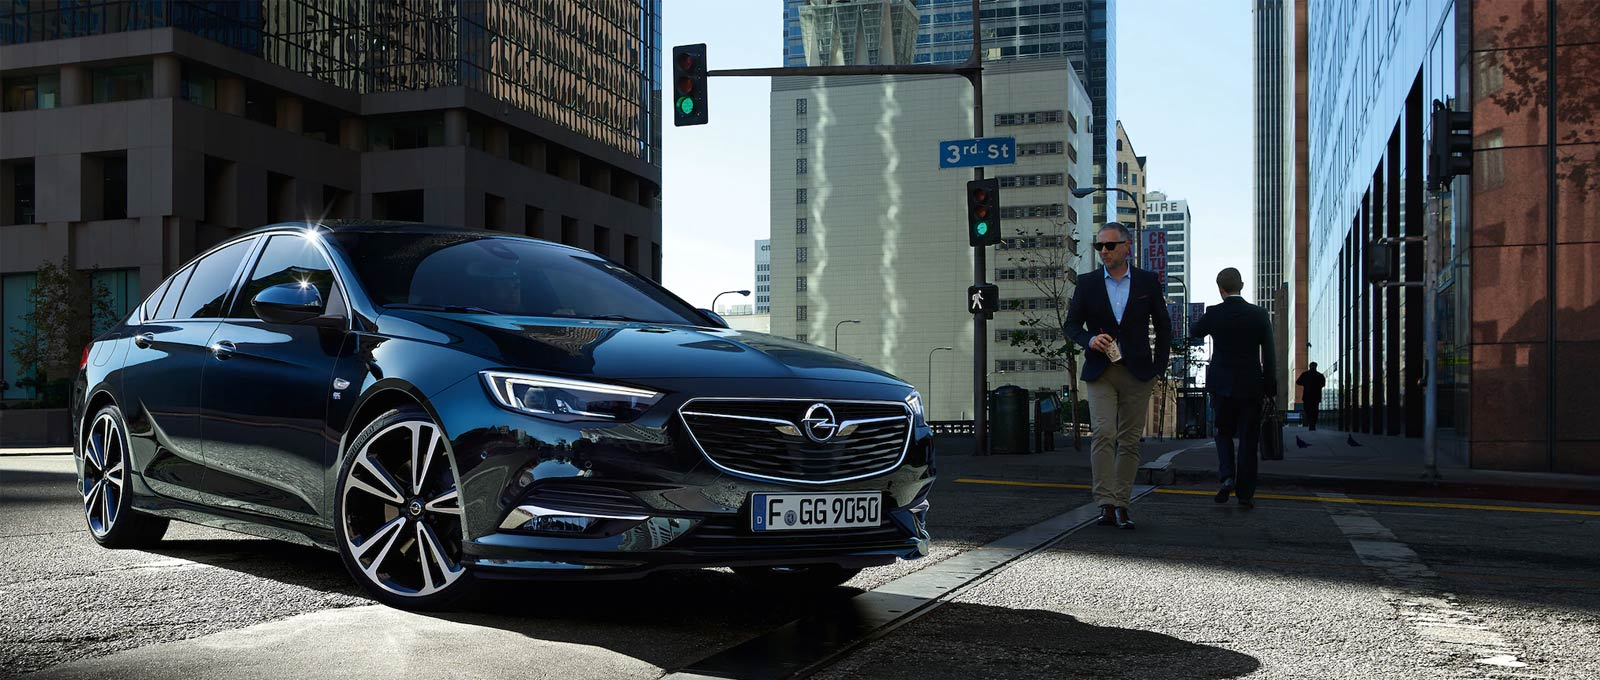 Opel Insignia Torino